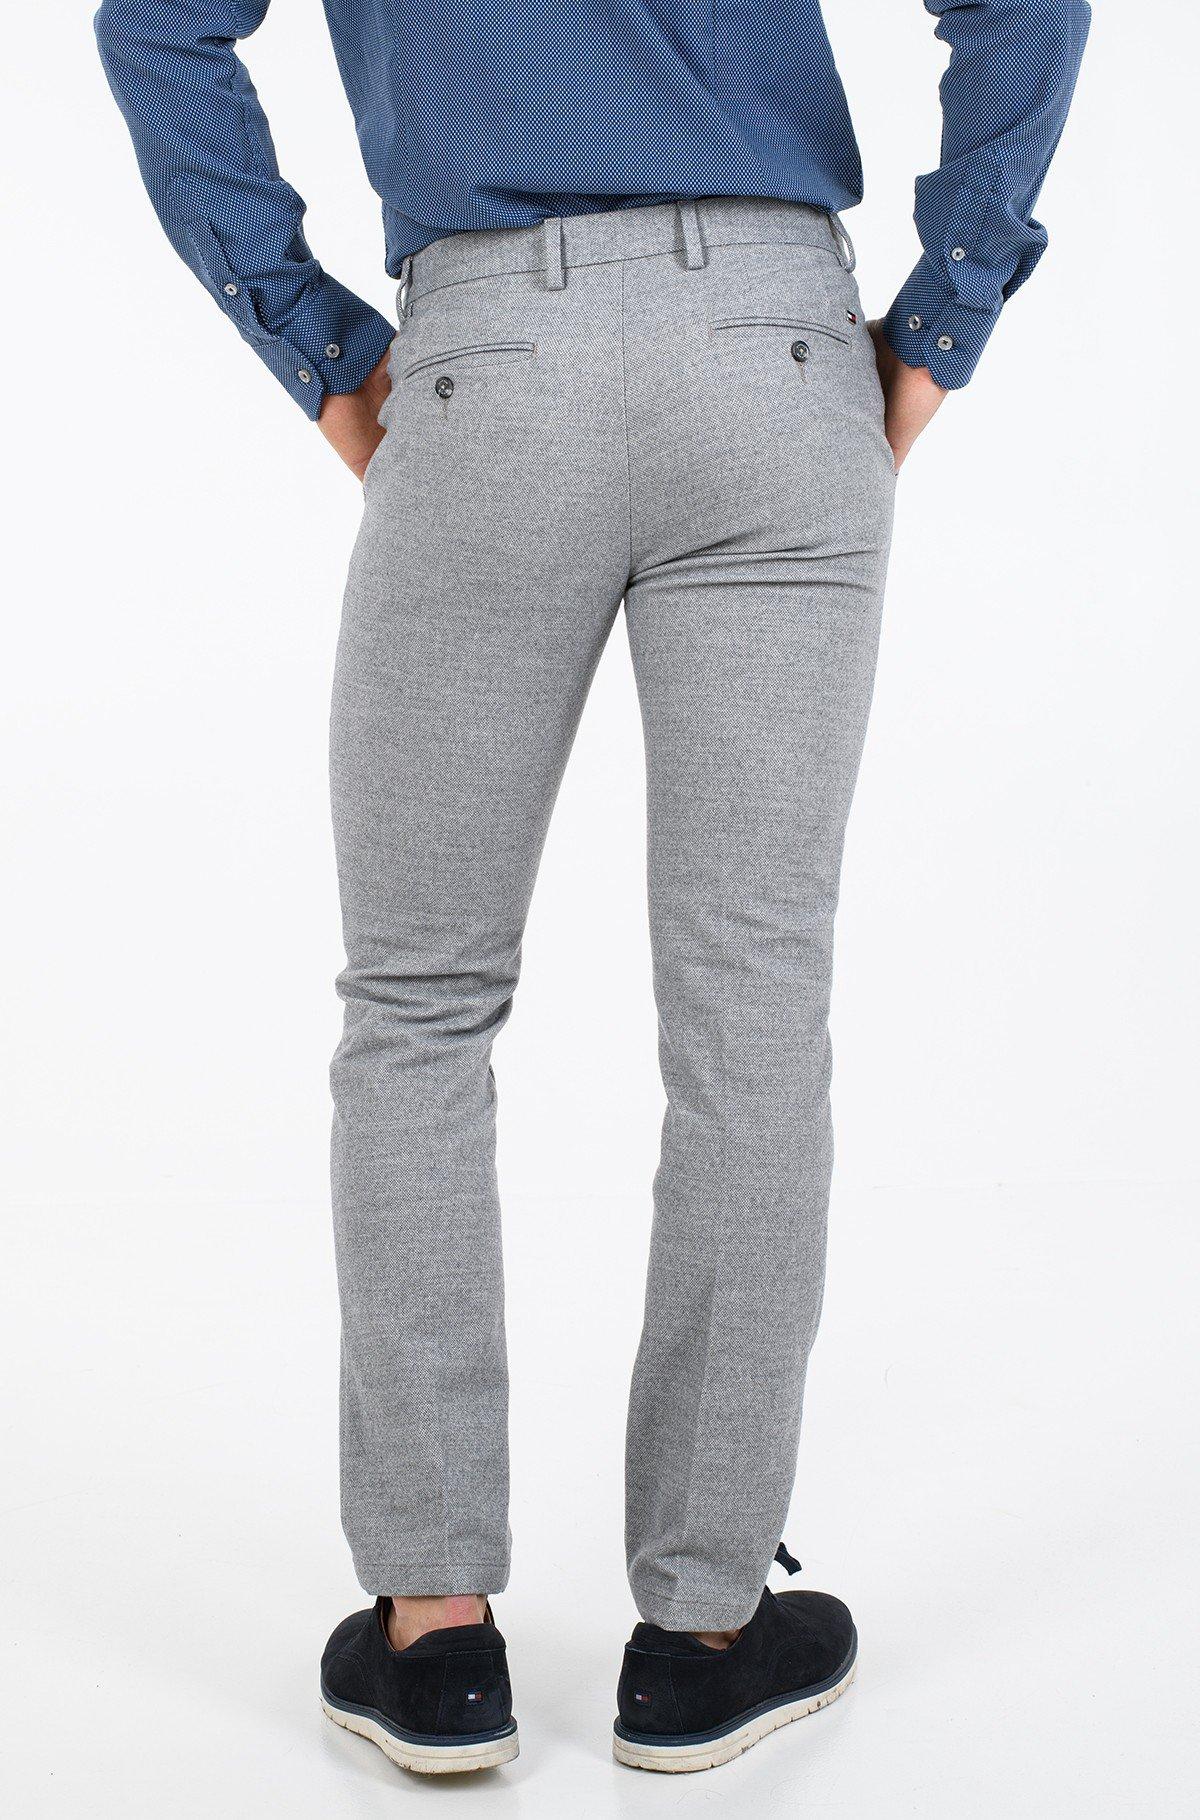 Suit trousers DENTON CHINO WOOL LOOK FLEX-full-2